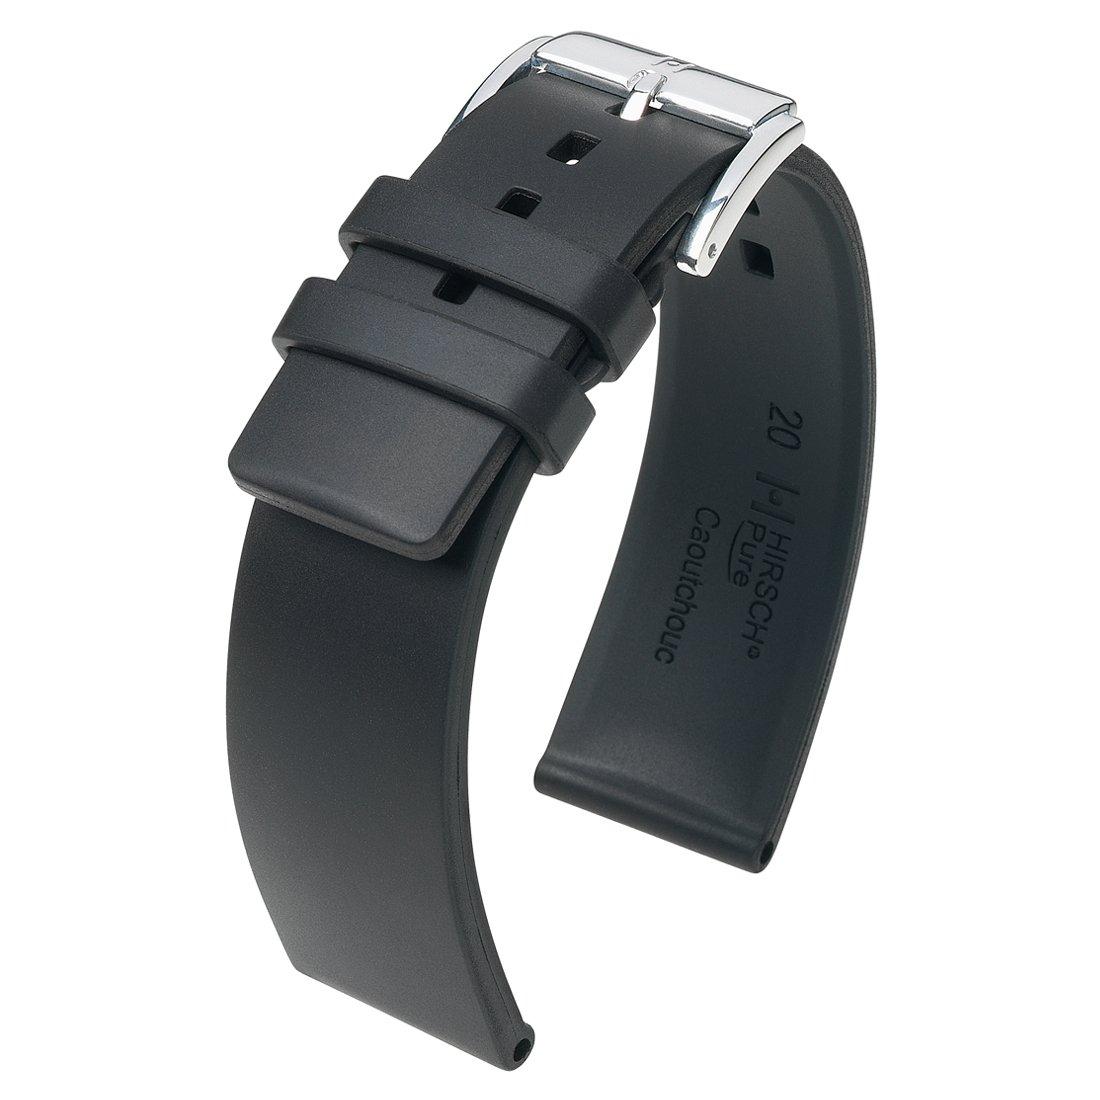 [HIRSCH]ヒルシュ 腕時計 革 ベルト ピュア 尾錠色:シルバー/ゴールド 時計側18mm 尾錠側16mm 尾錠色:<シルバー> 1.ブラック 1.ブラック 時計側18mm 尾錠側16mm 尾錠色:<シルバー> B076BKFXJM